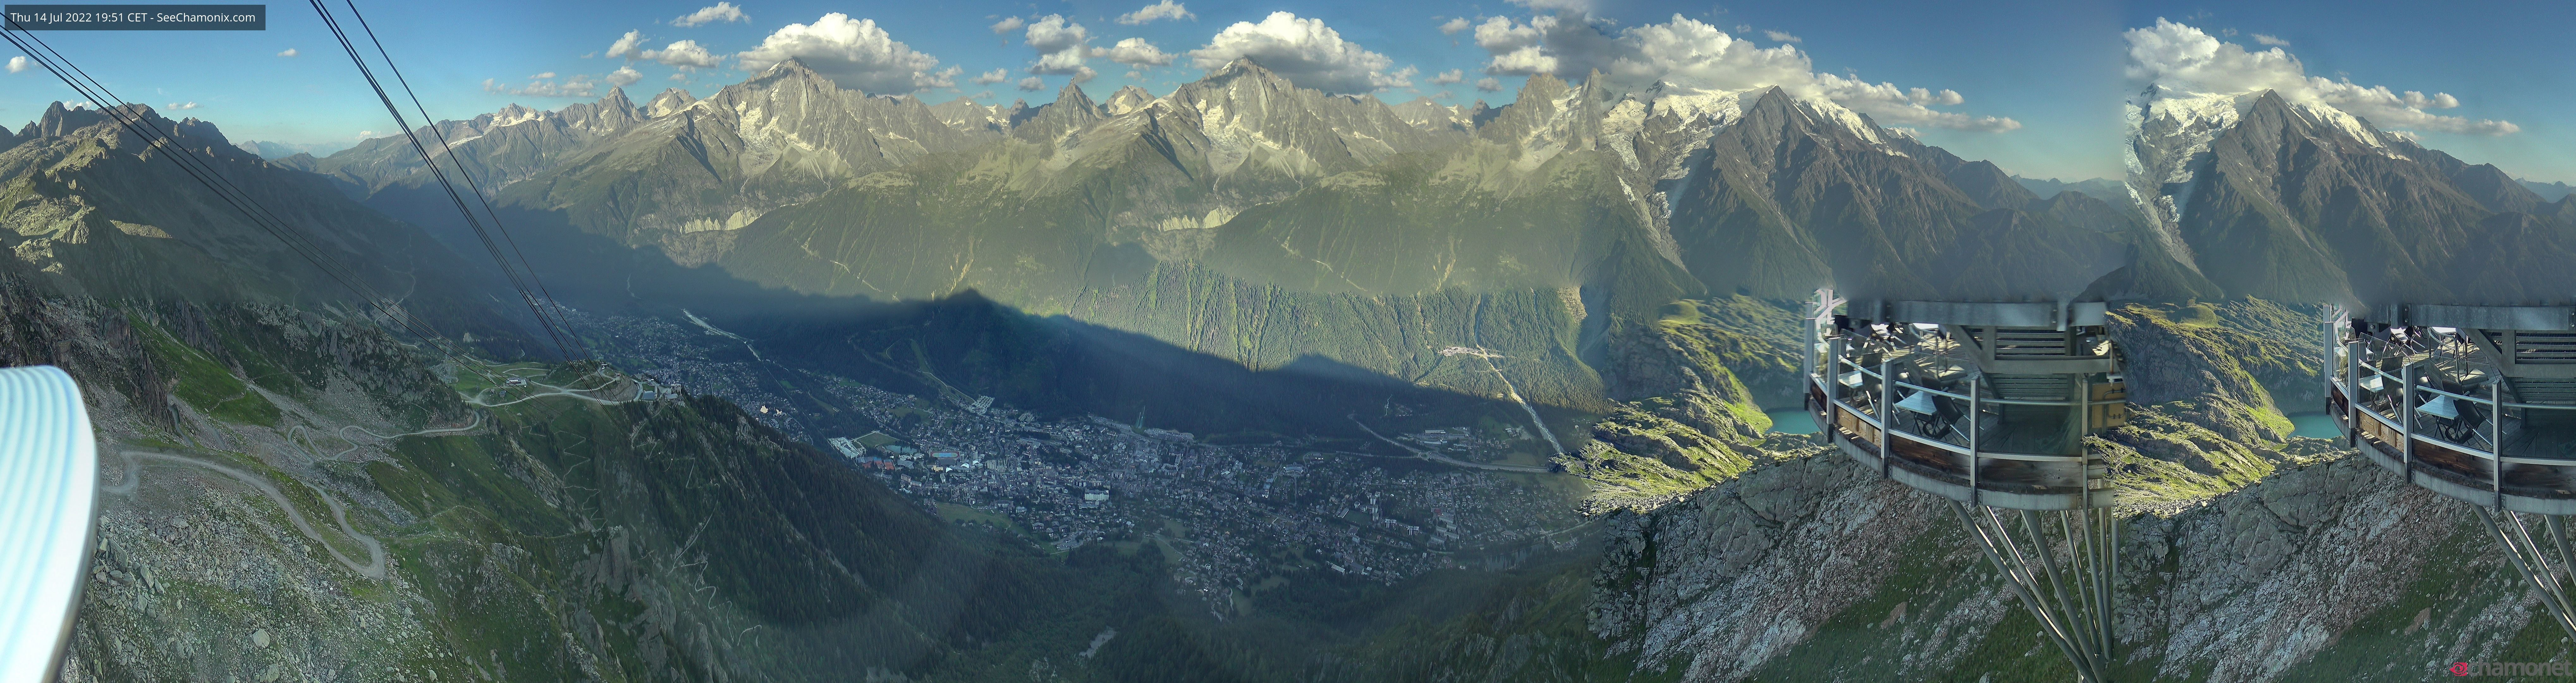 Chamonix Chamonet.com Mont Blanc webcam